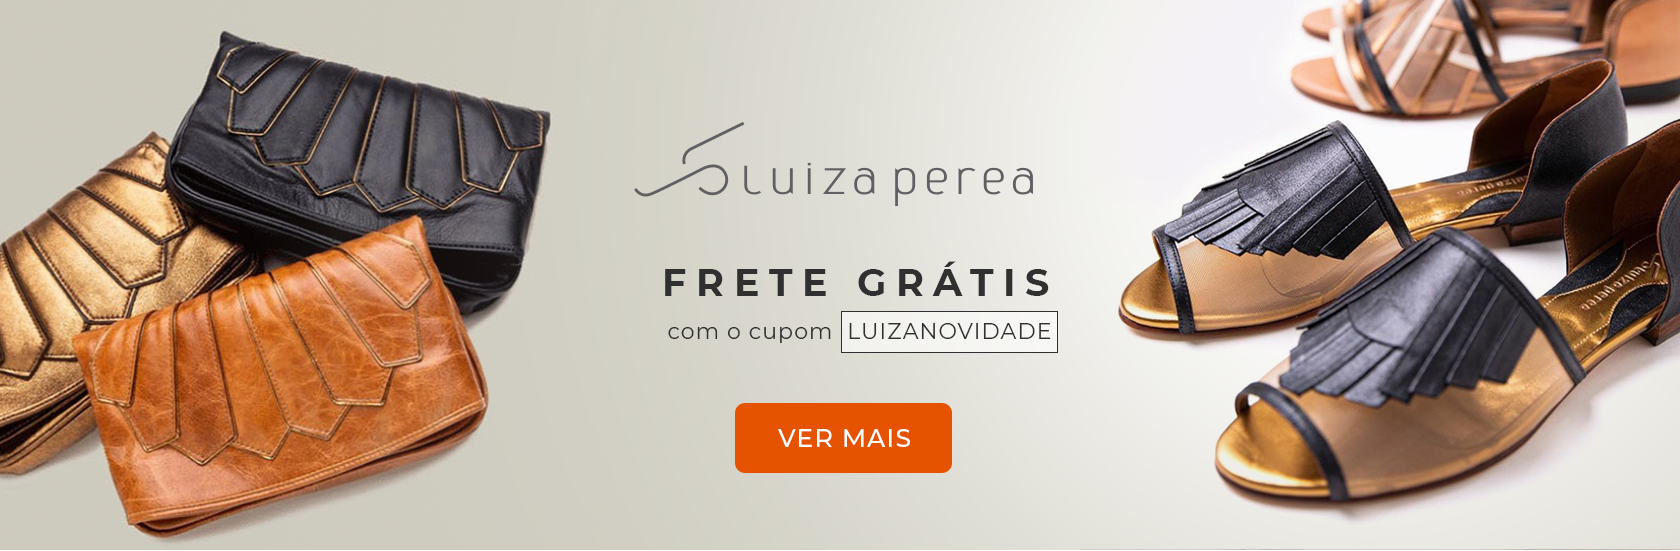 Banner 2 - LUIZA PEREA